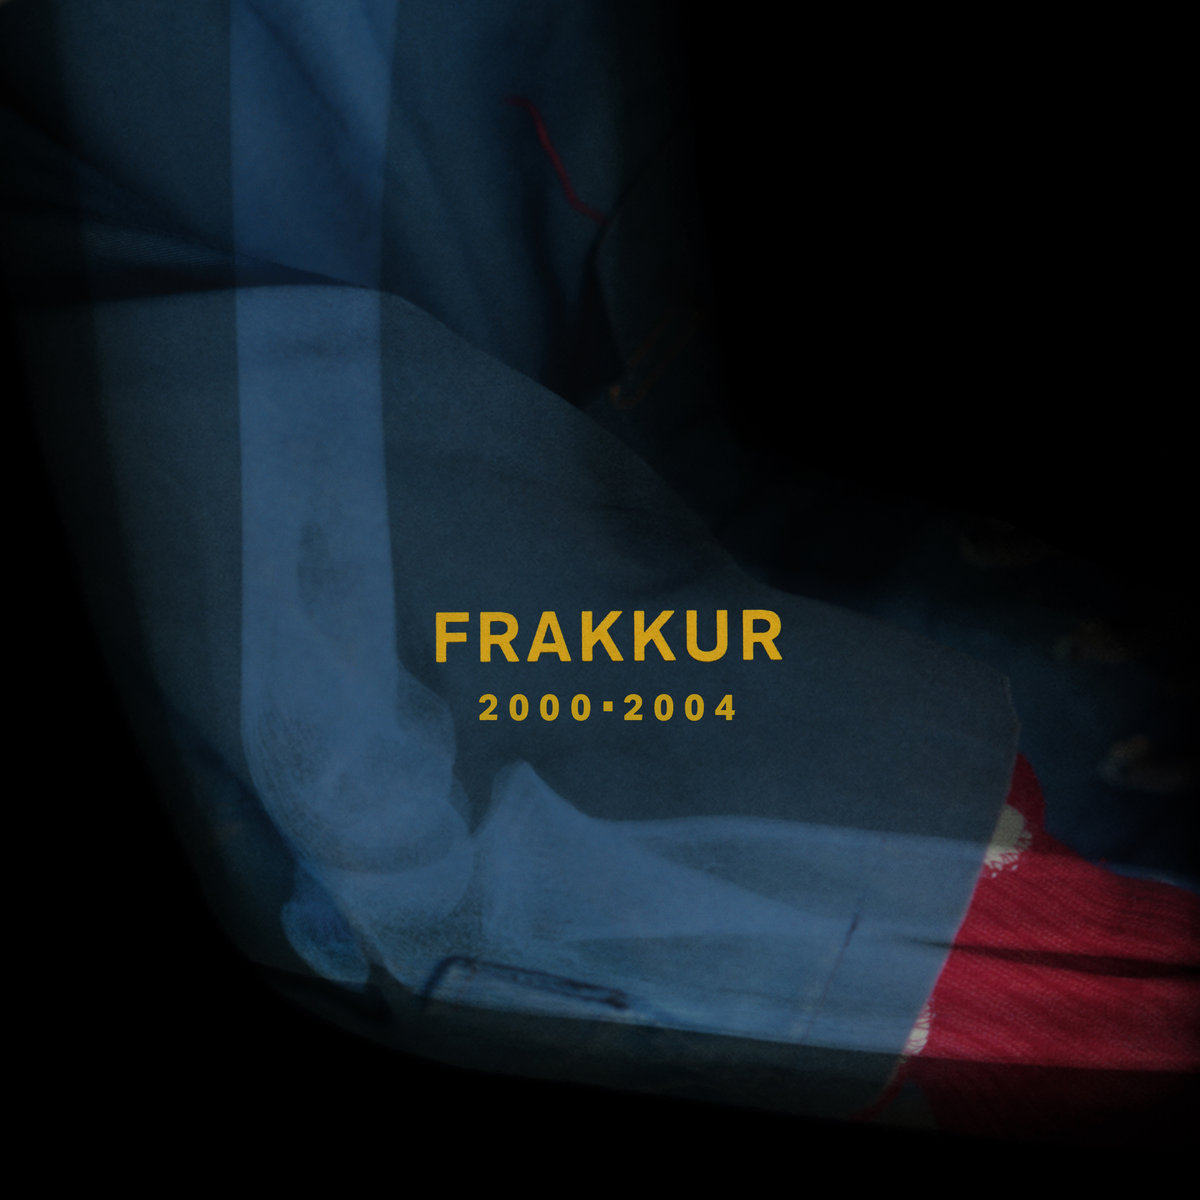 Frakkur (Jónsi -Sigur Rós) - 2000-2004 [3xLP]